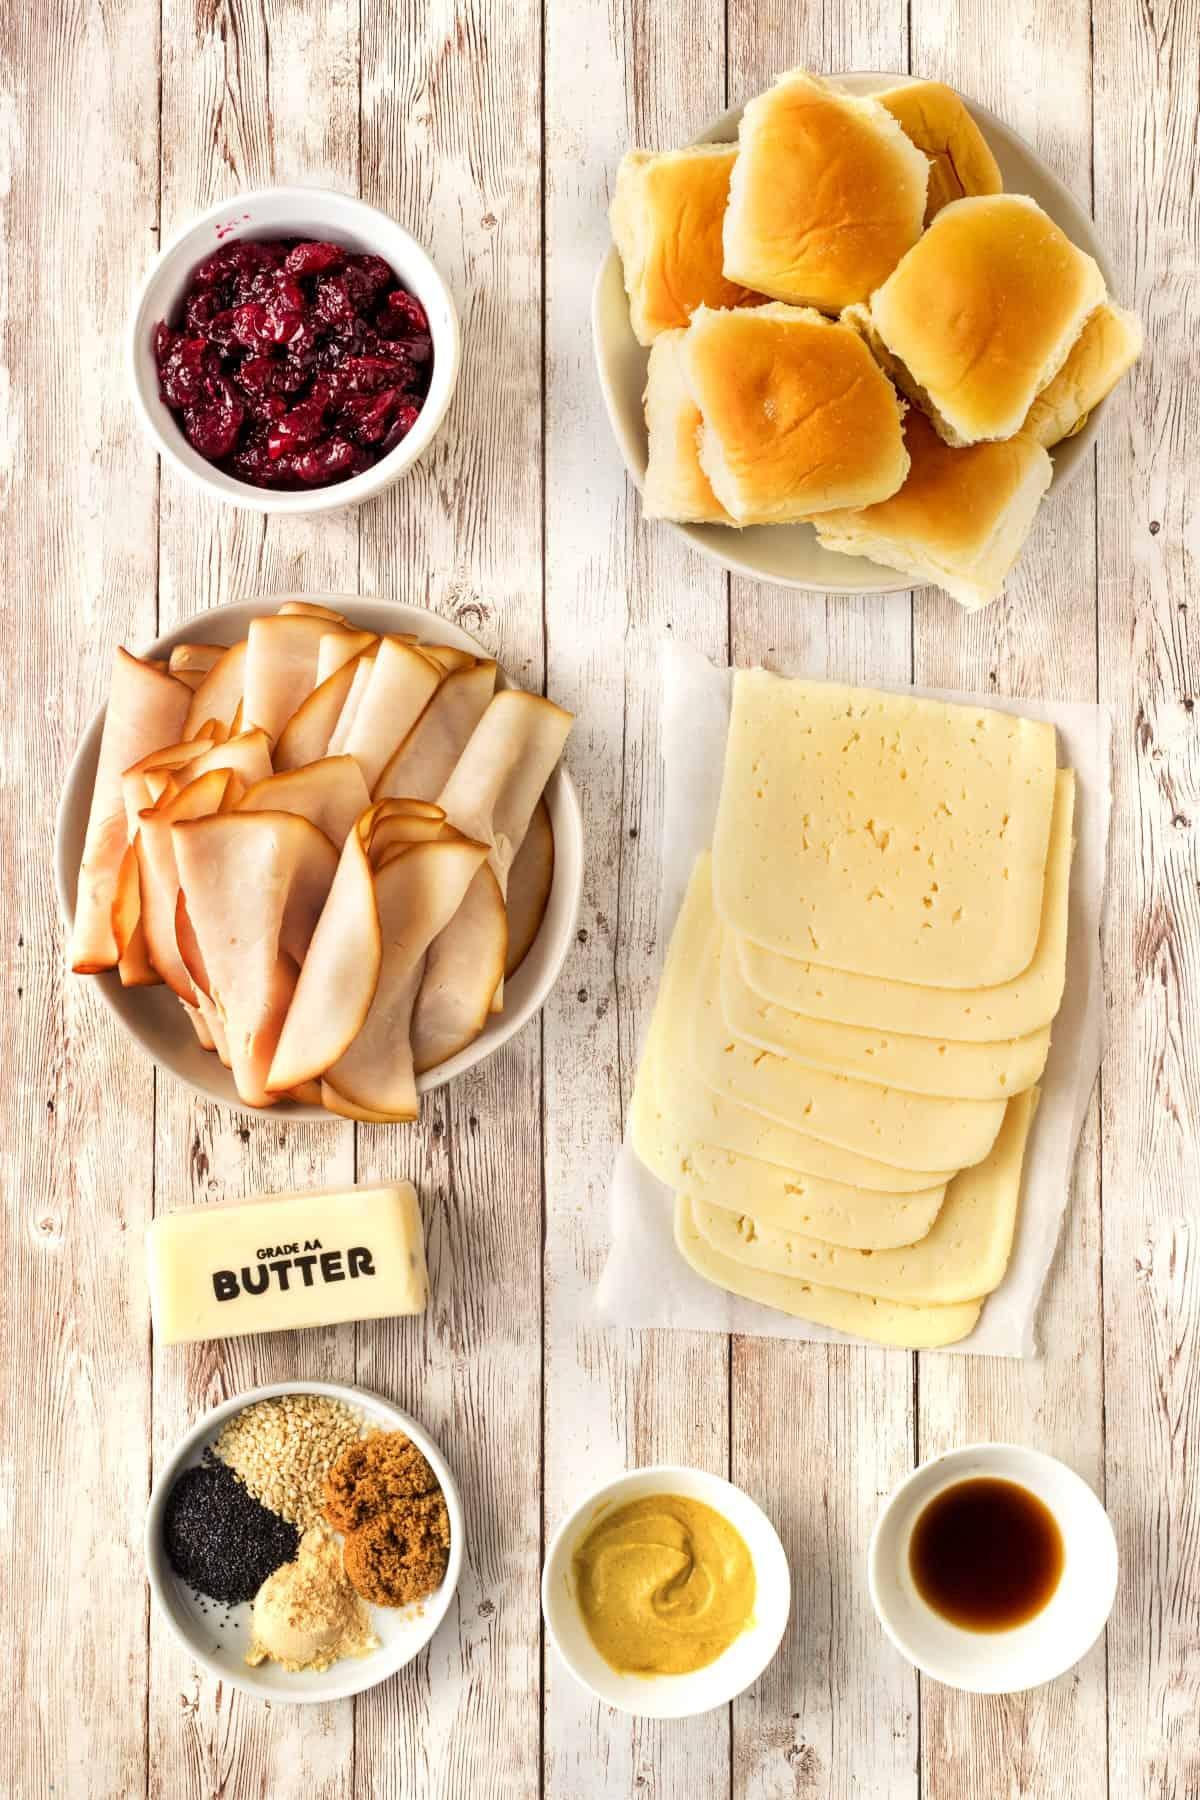 Ingredients for Havarti Cranberry Turkey Sliders